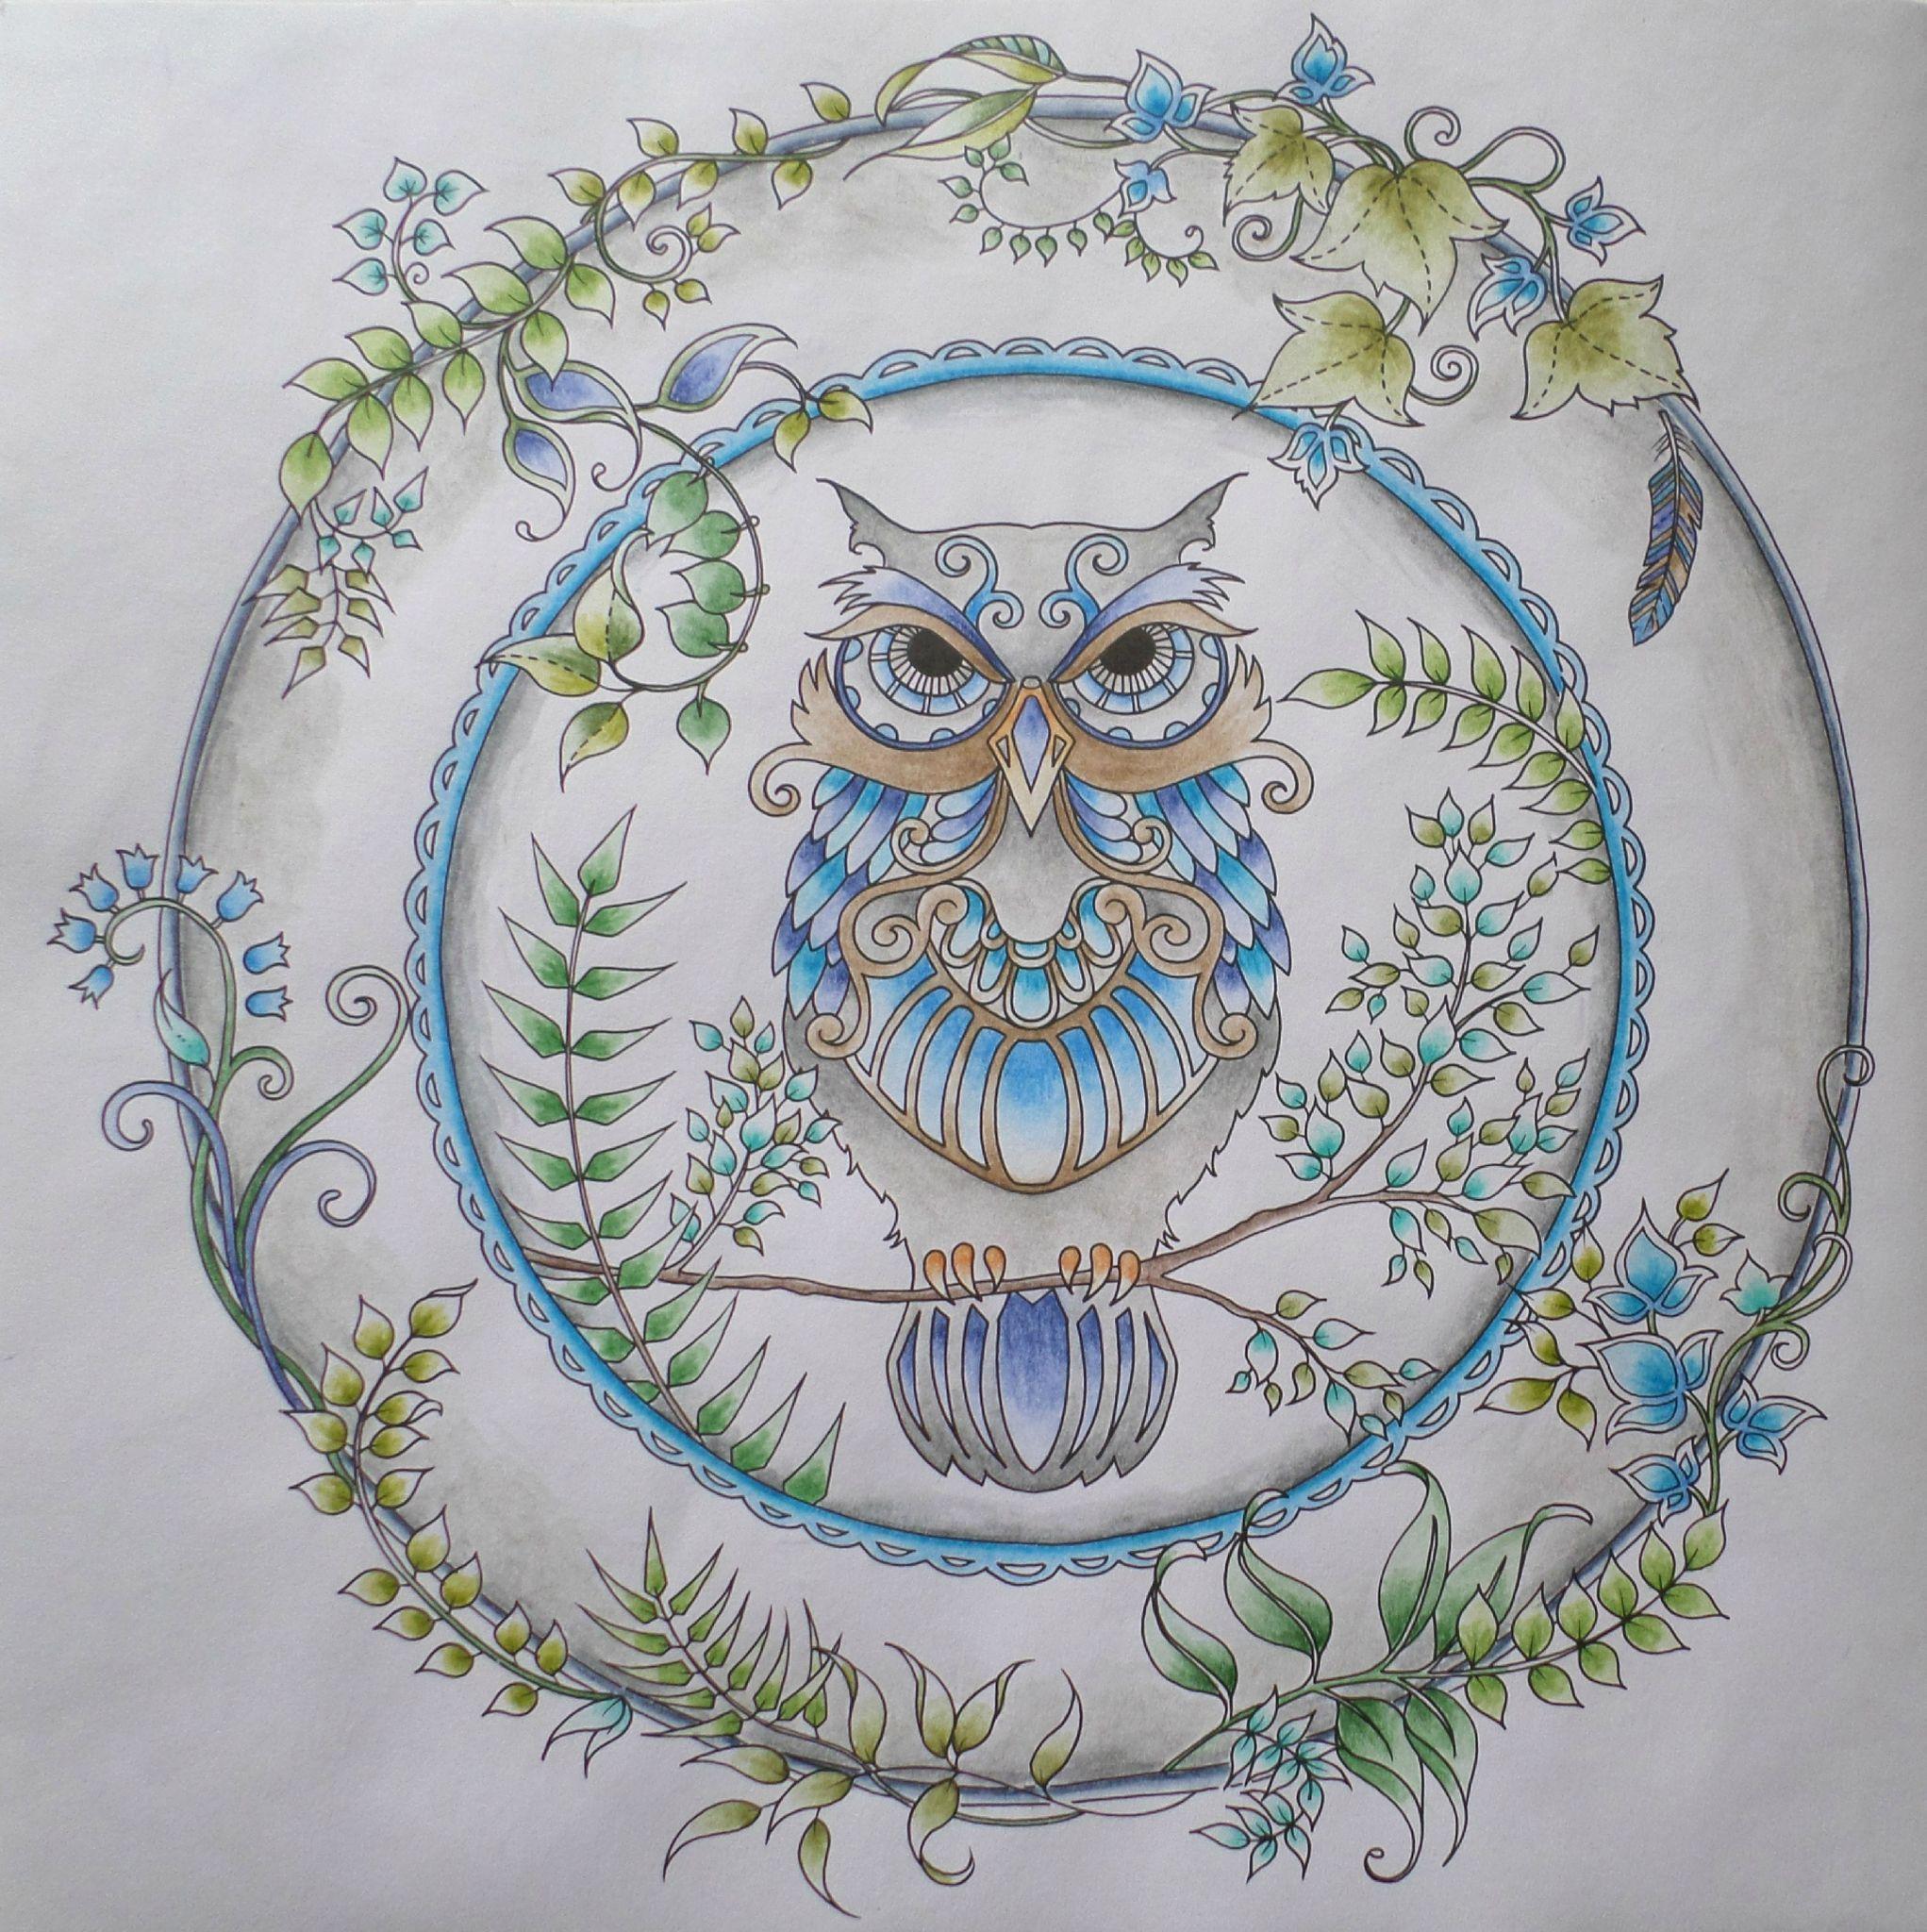 Coloriage livre Forªt Enchantée Johanna Basford Hibou par steffy Elsass crea